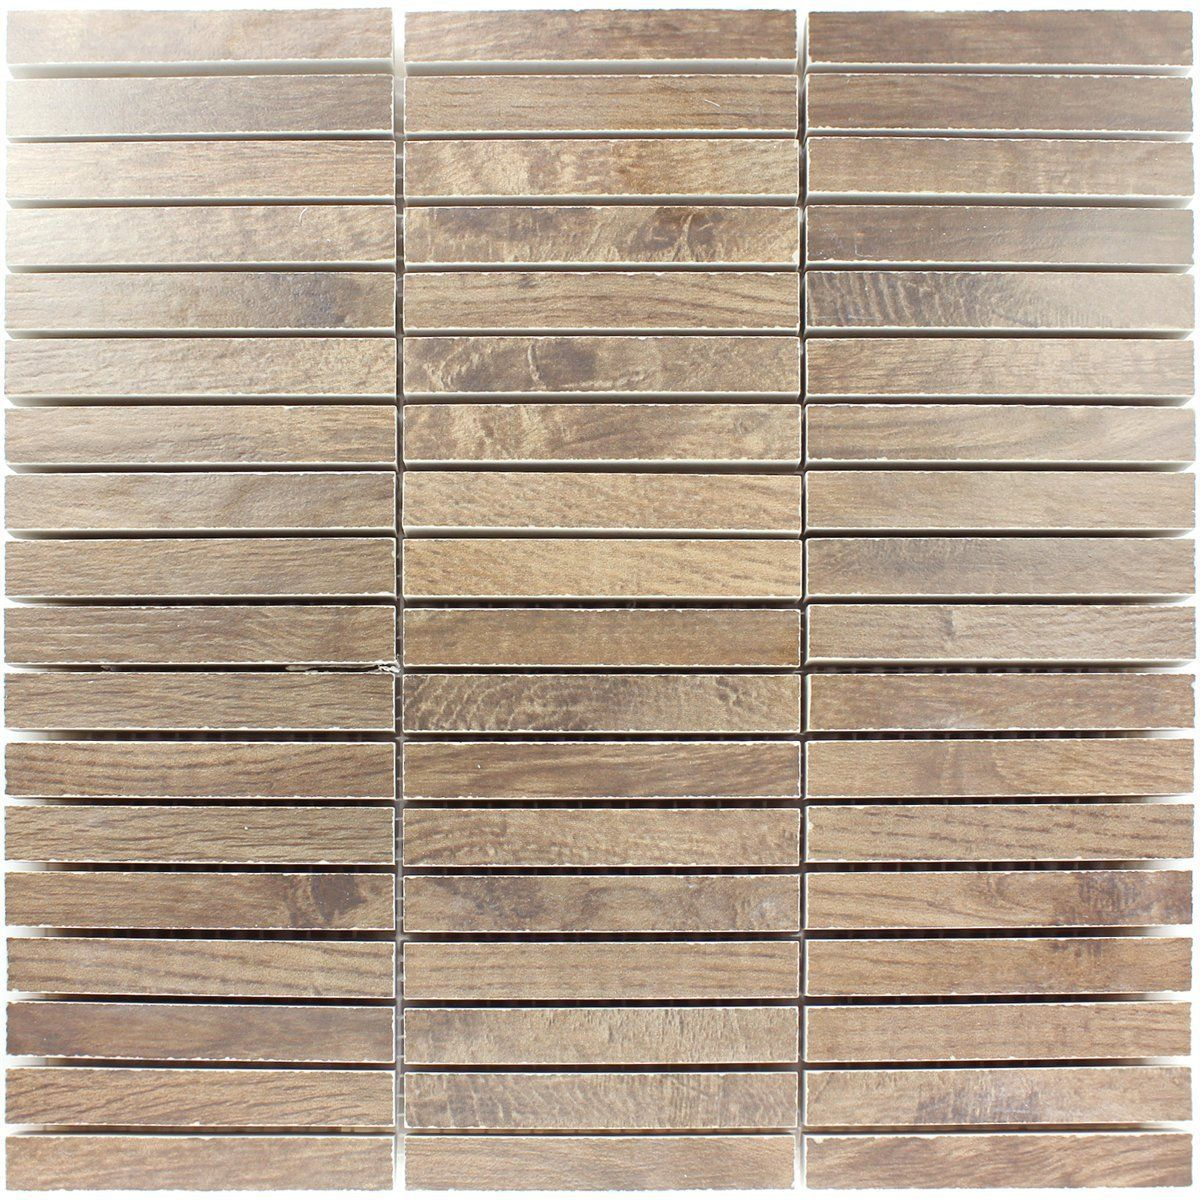 Loures Holzoptik Wood Mosaik Fliesen Braun | EBay